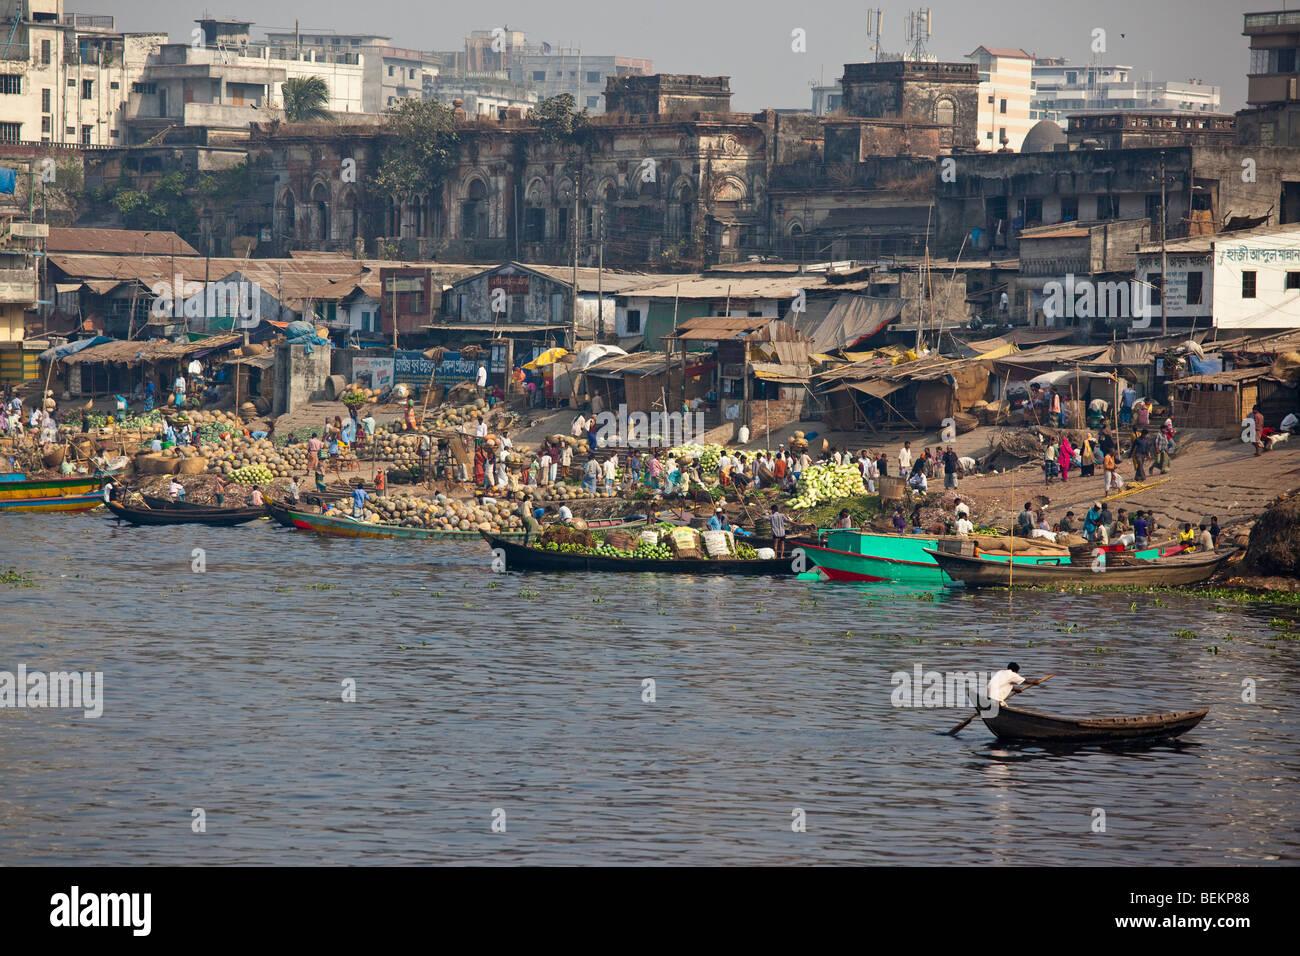 8514c1006ce vegetables-arriving-at-the-wholesale-vegetable-market-in-old-dhaka-BEKP88.jpg